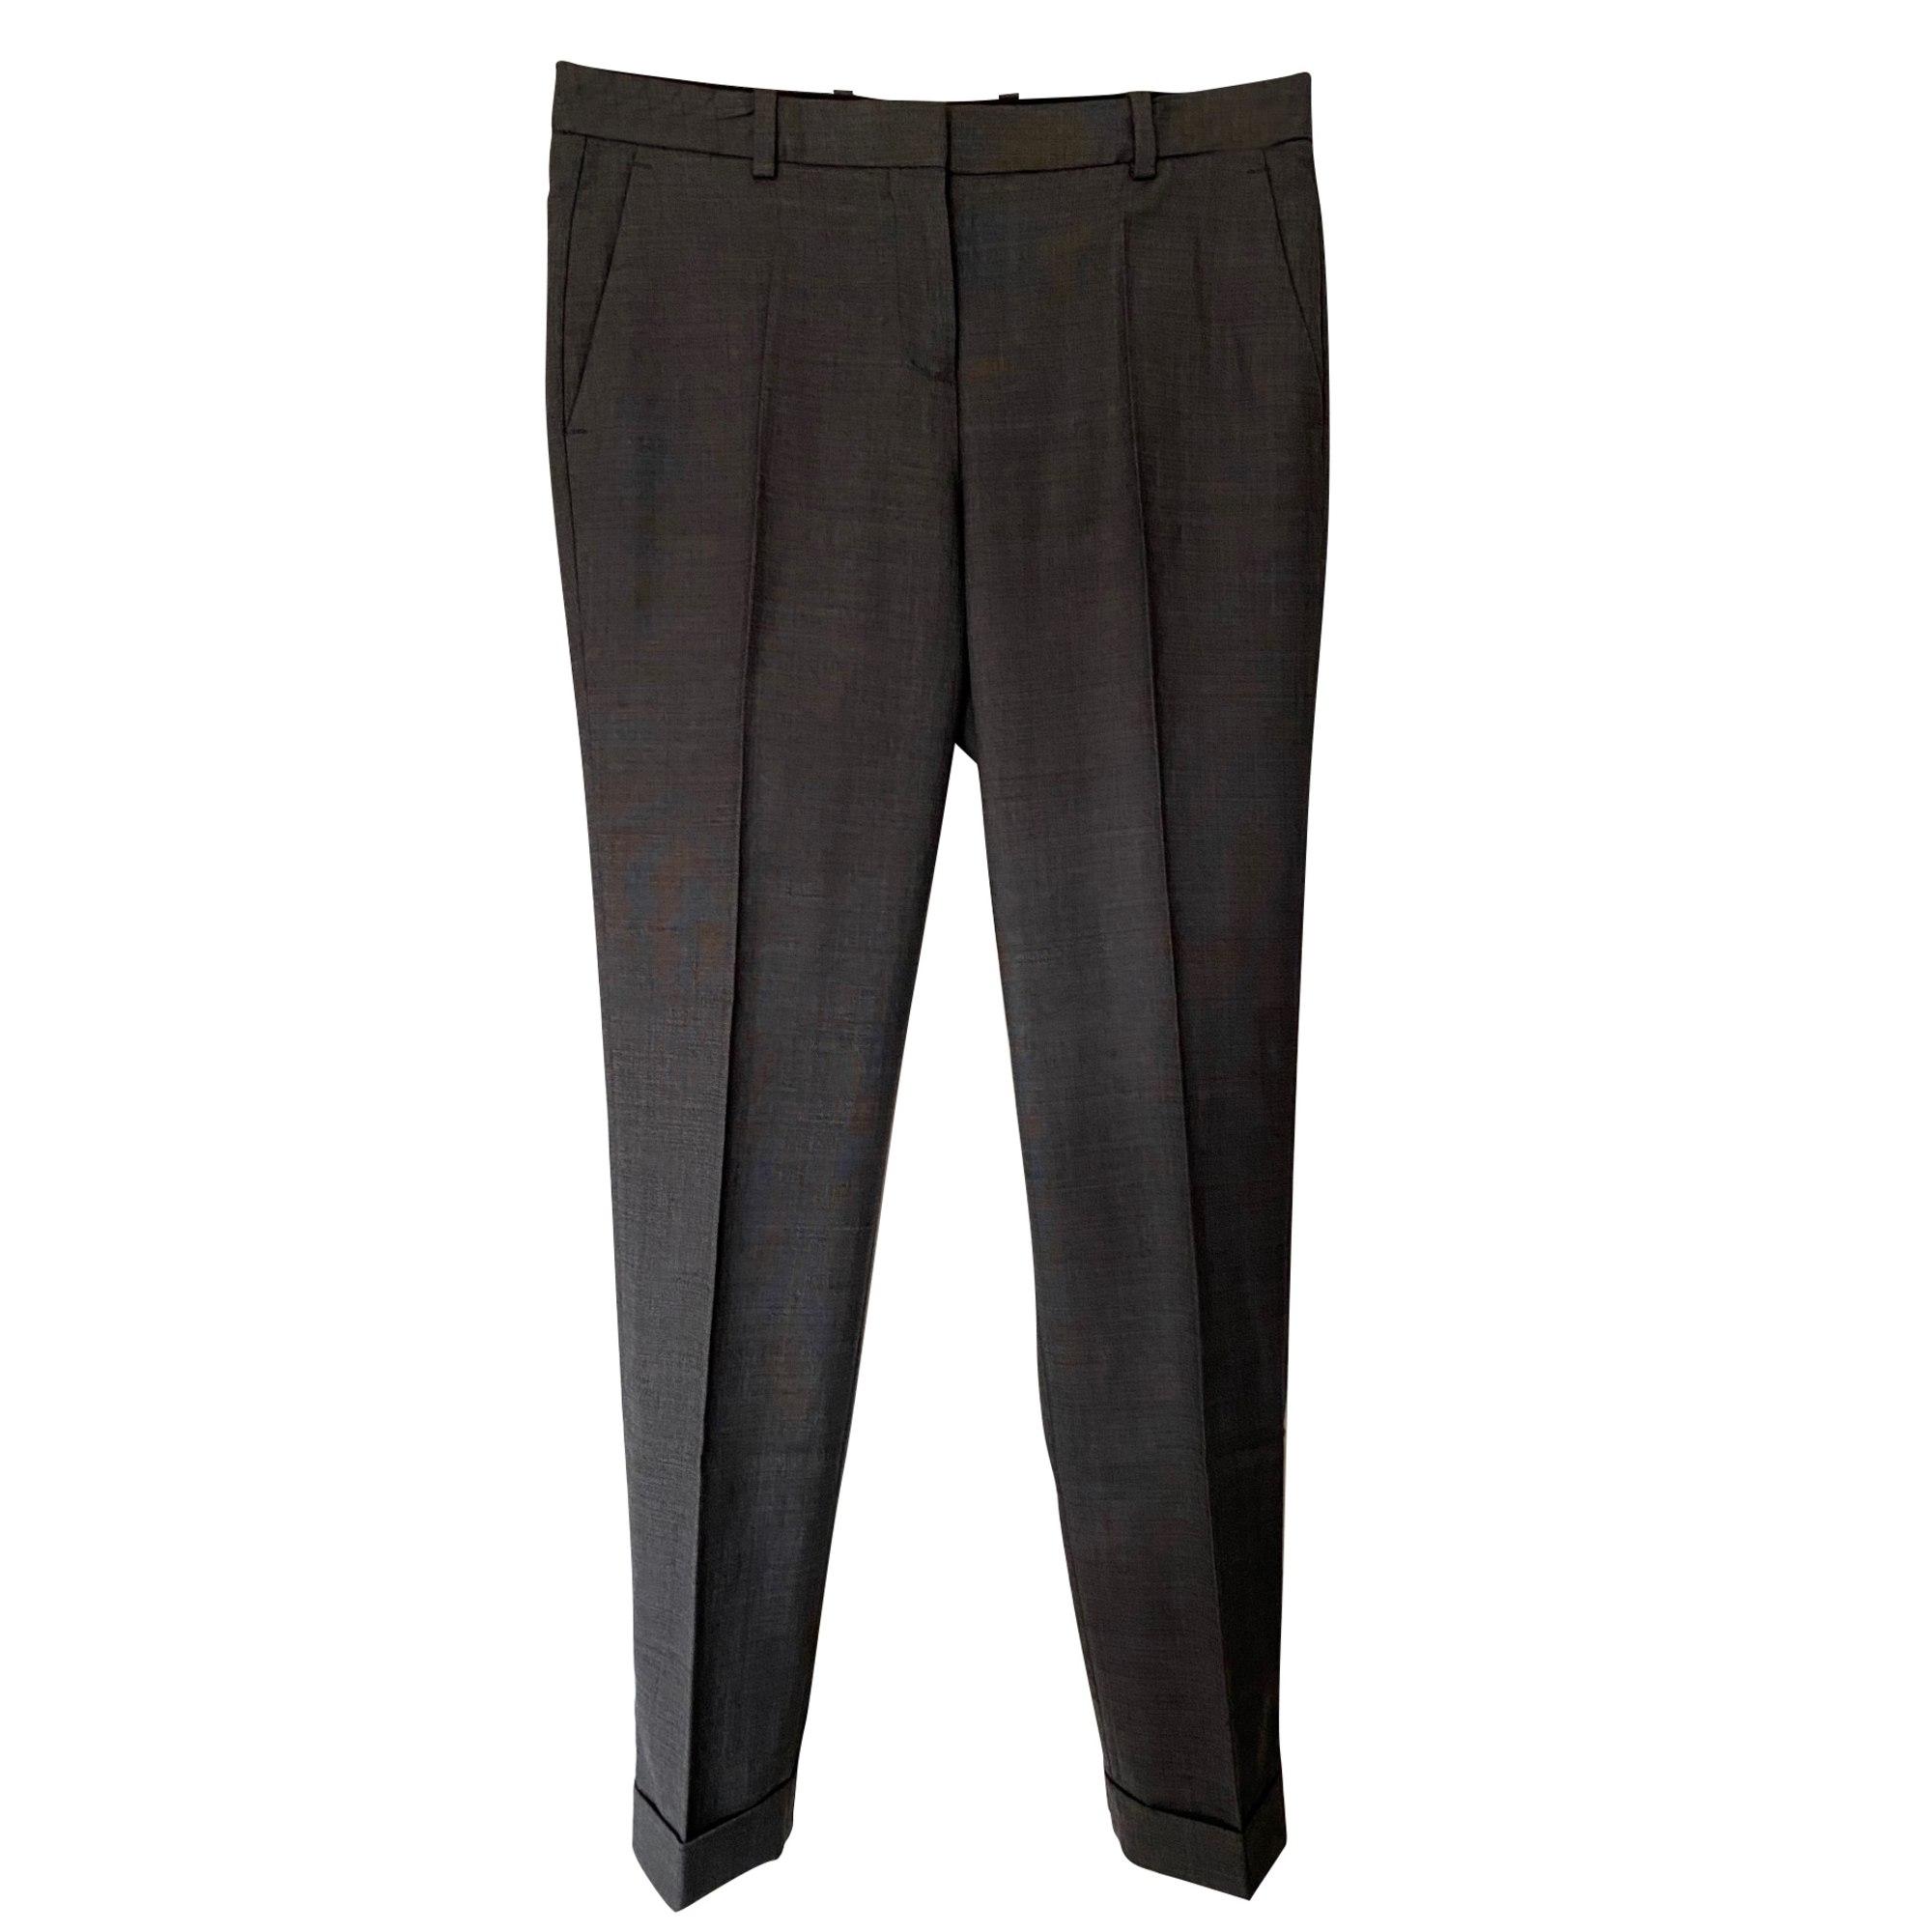 Tailleur pantalon THE KOOPLES Gris, anthracite